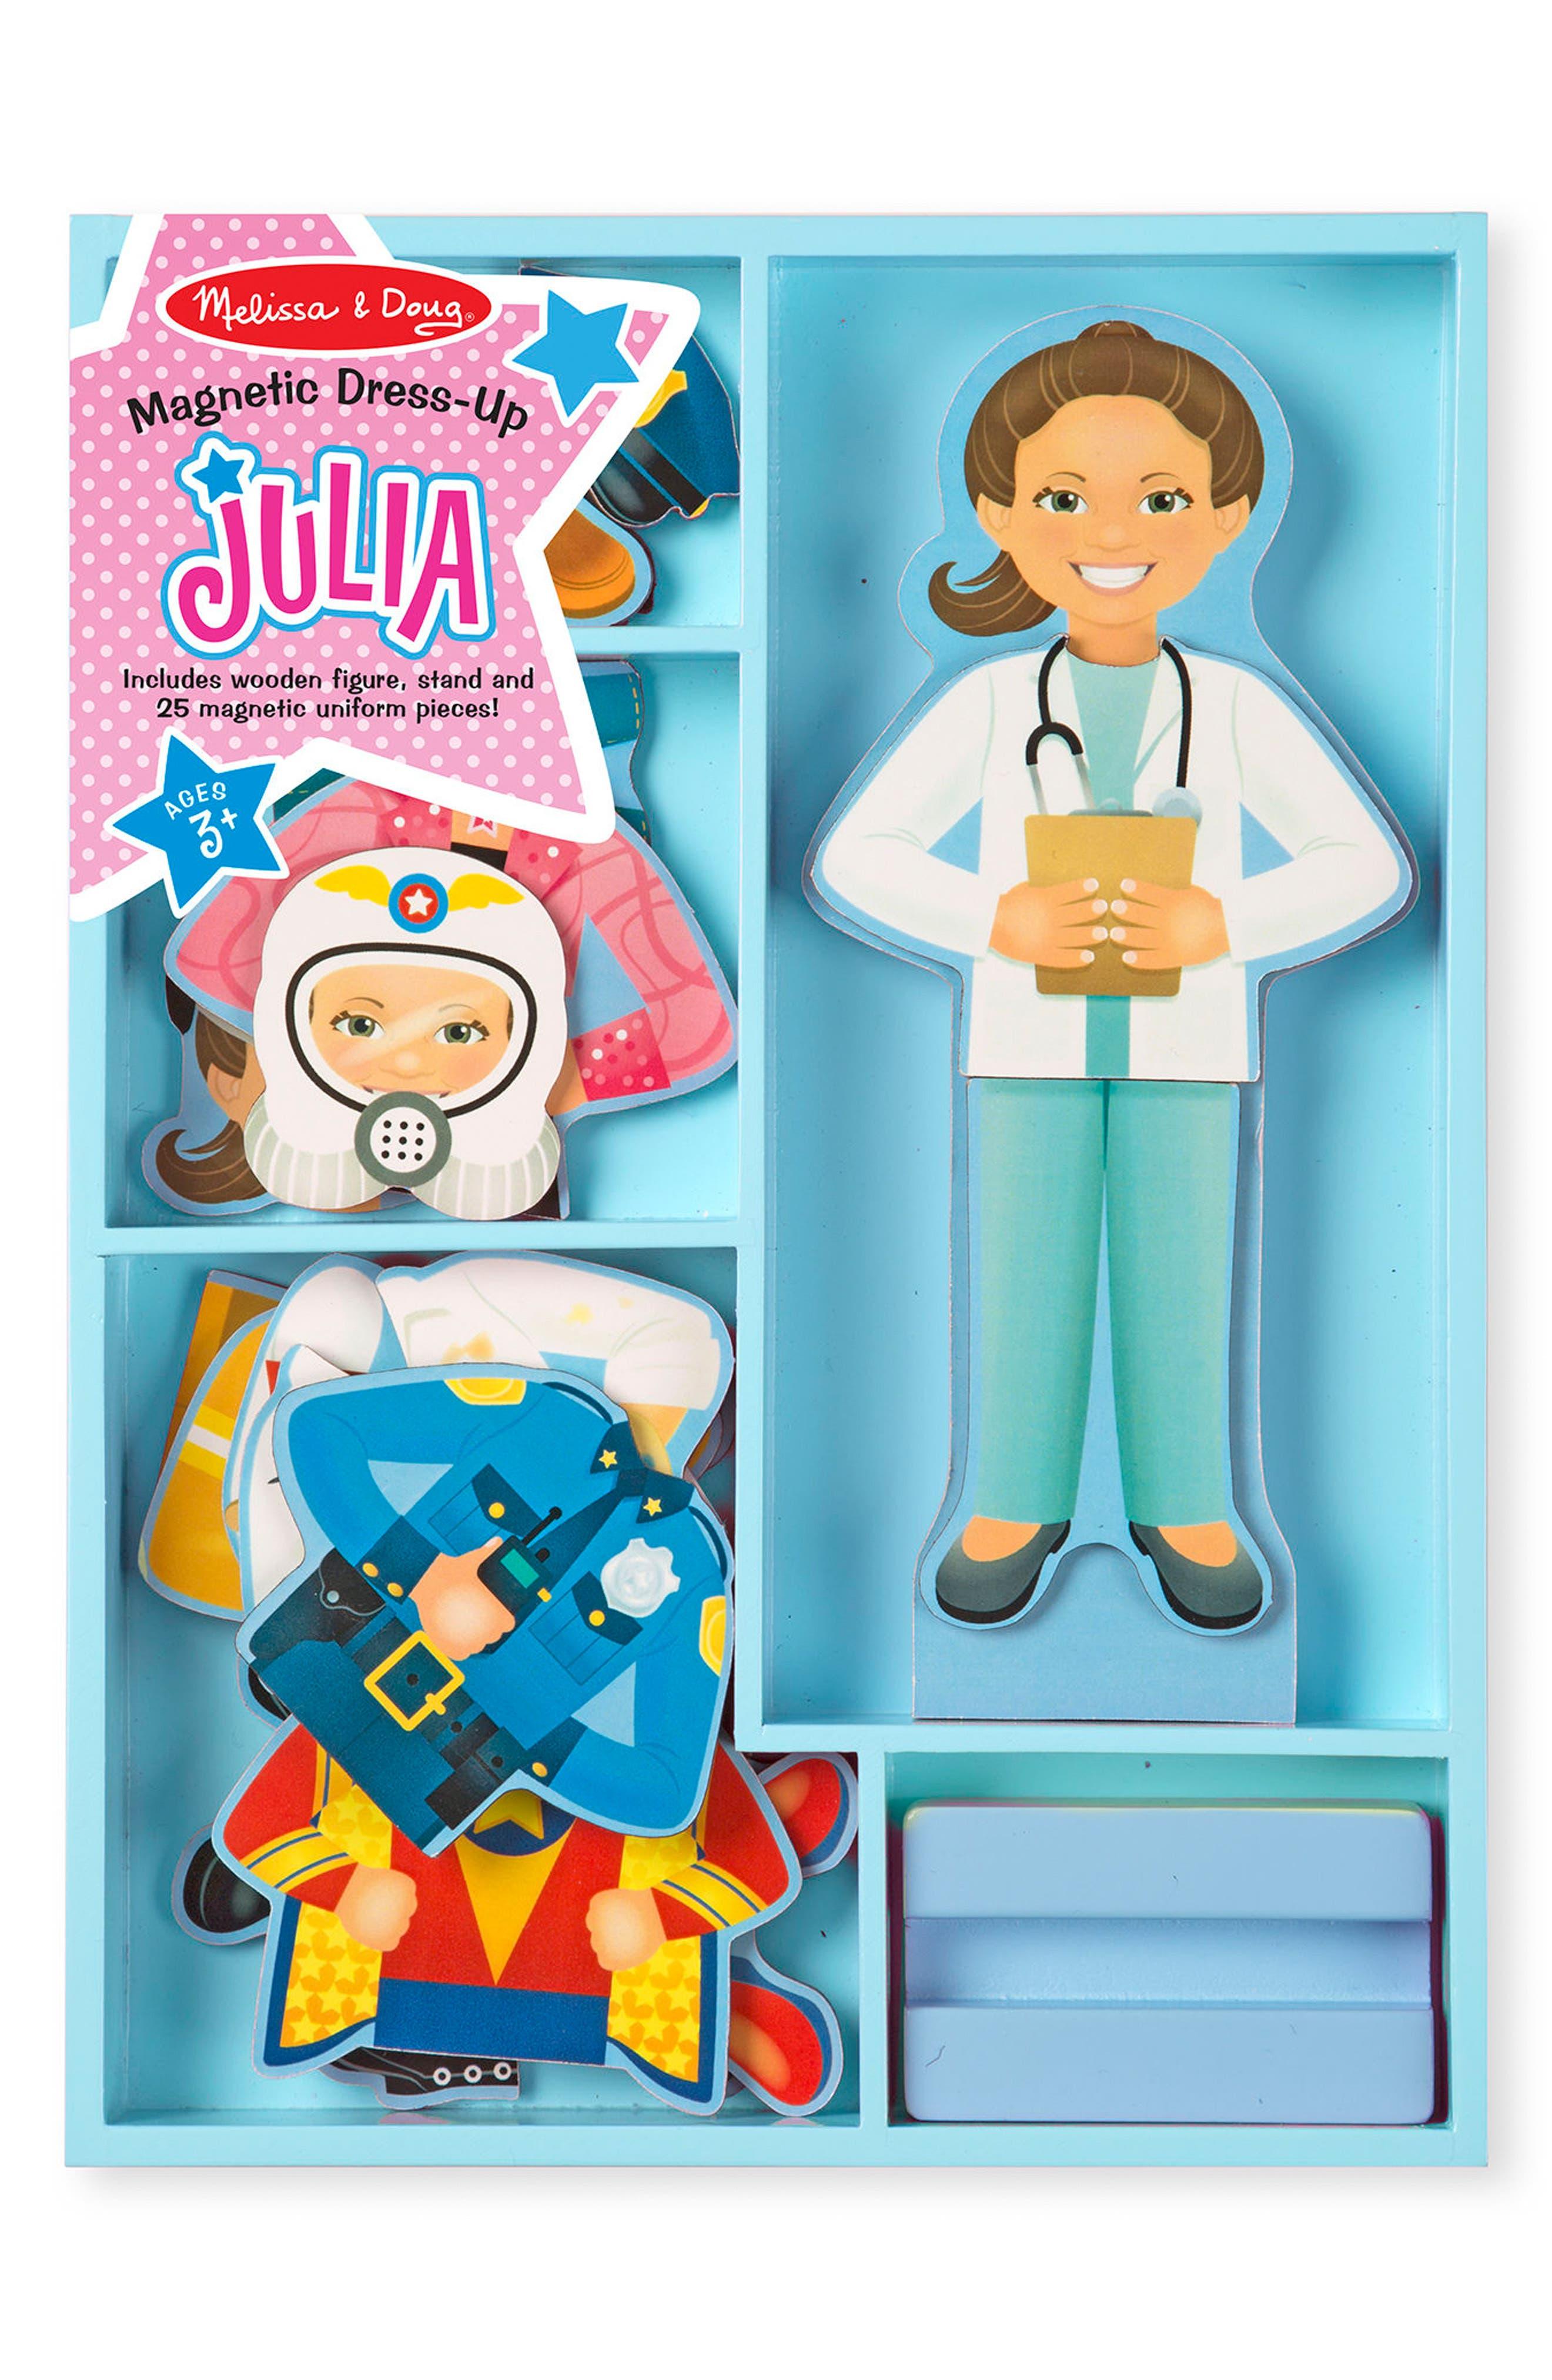 Melissa & Doug 27-Piece Magnetic Dress-Up Julia Doll